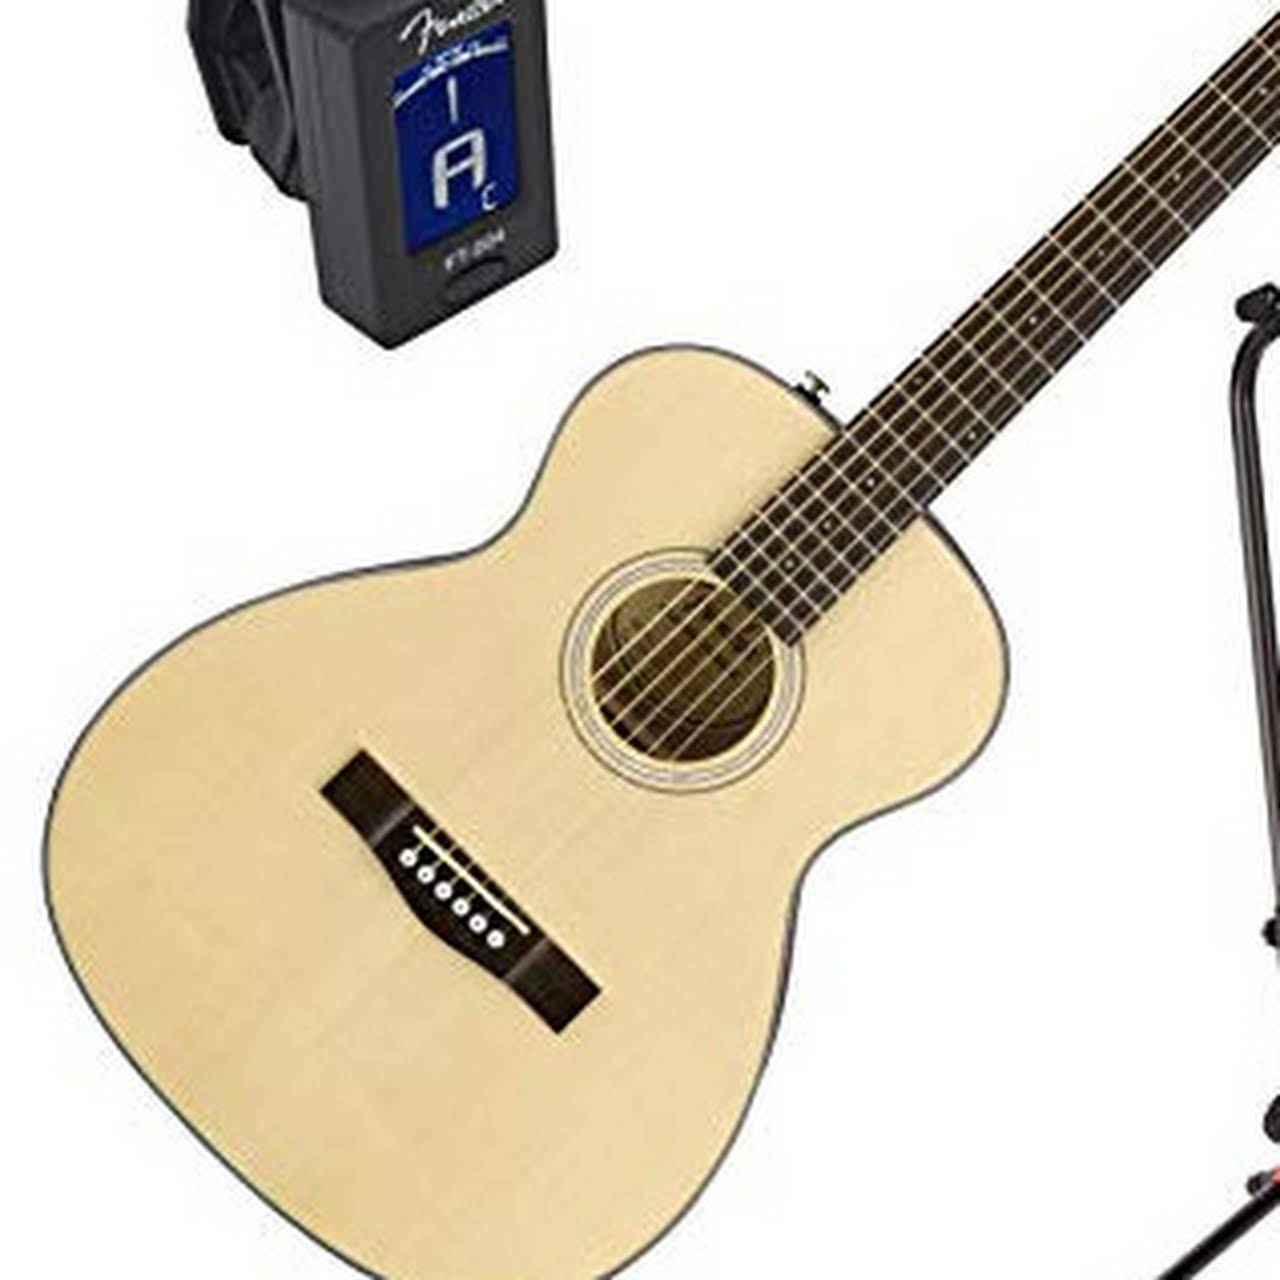 Price Of Yamaha Guitar In Nepal